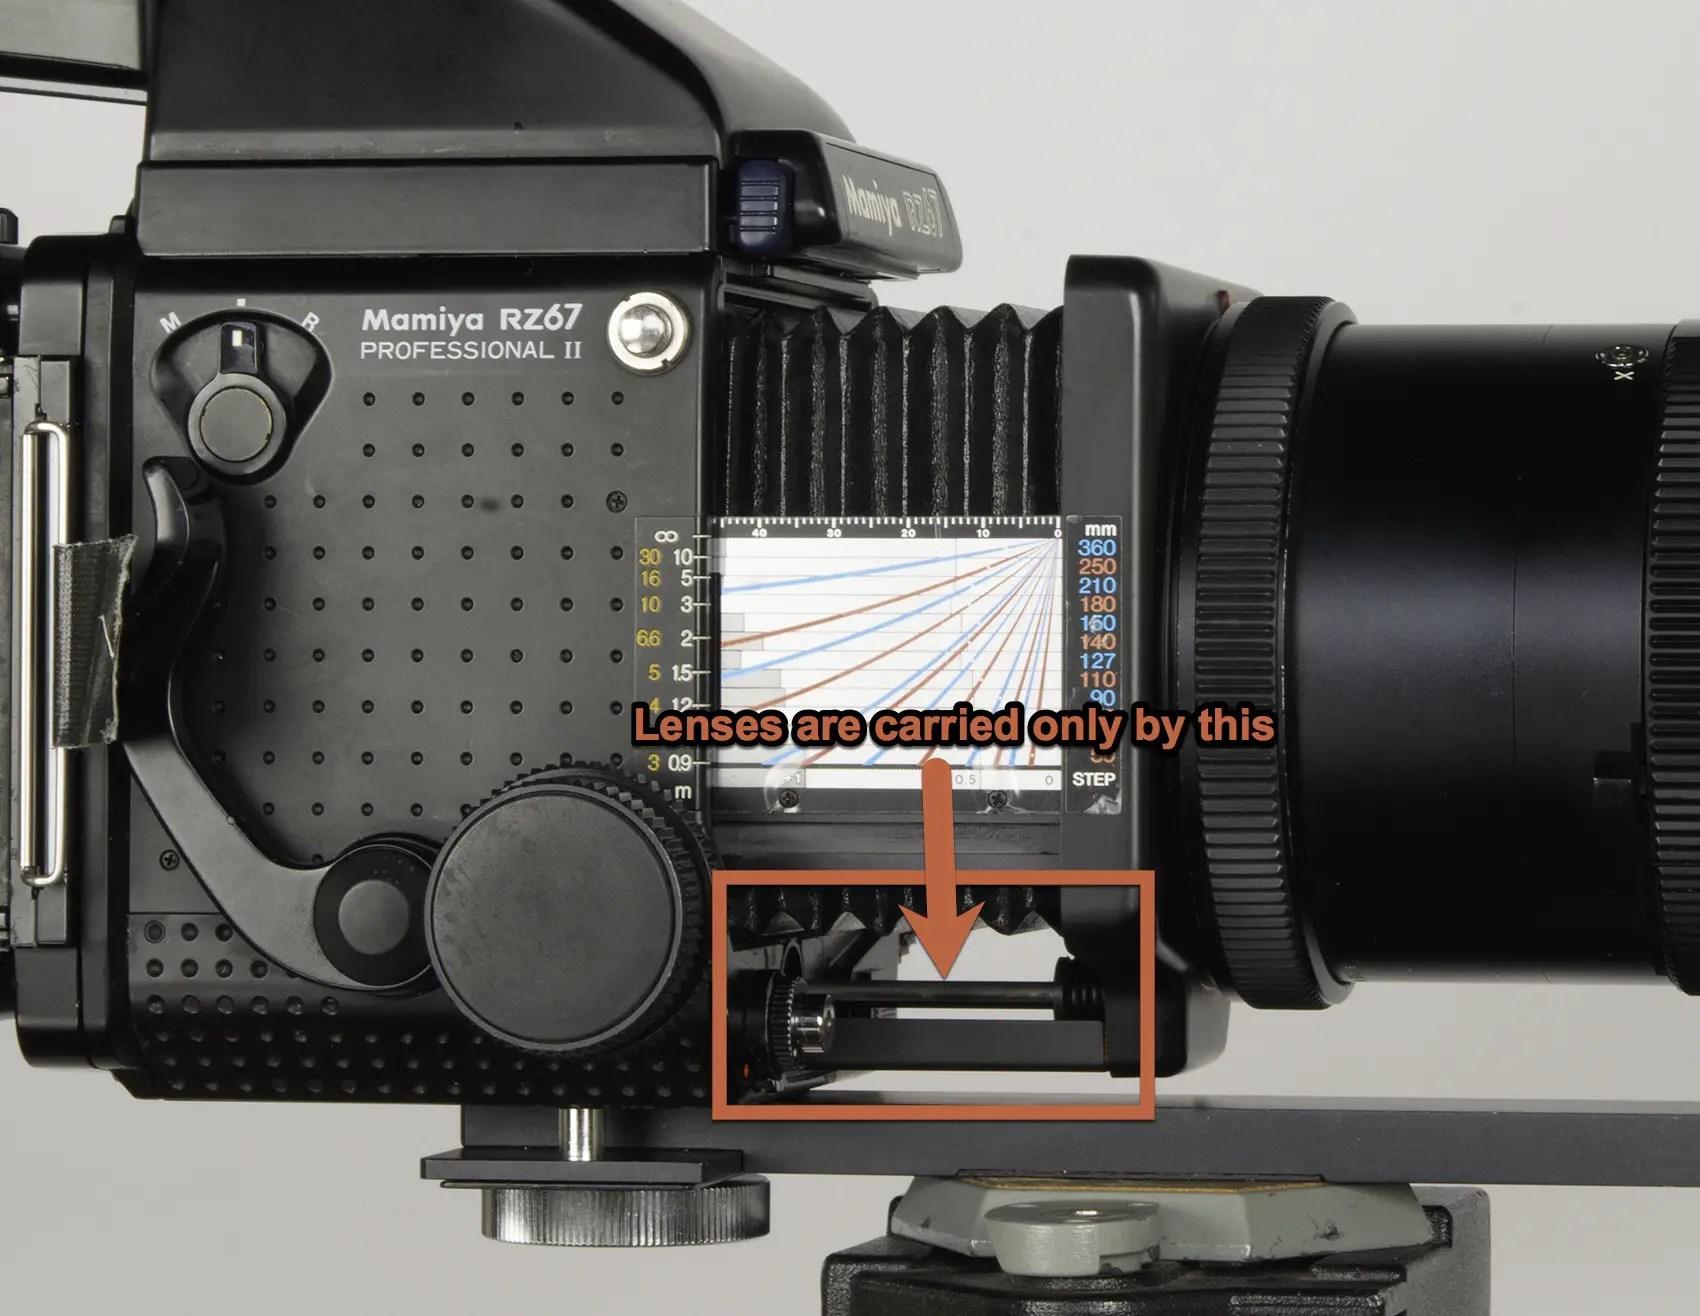 Mamiya bellows/lens mount support